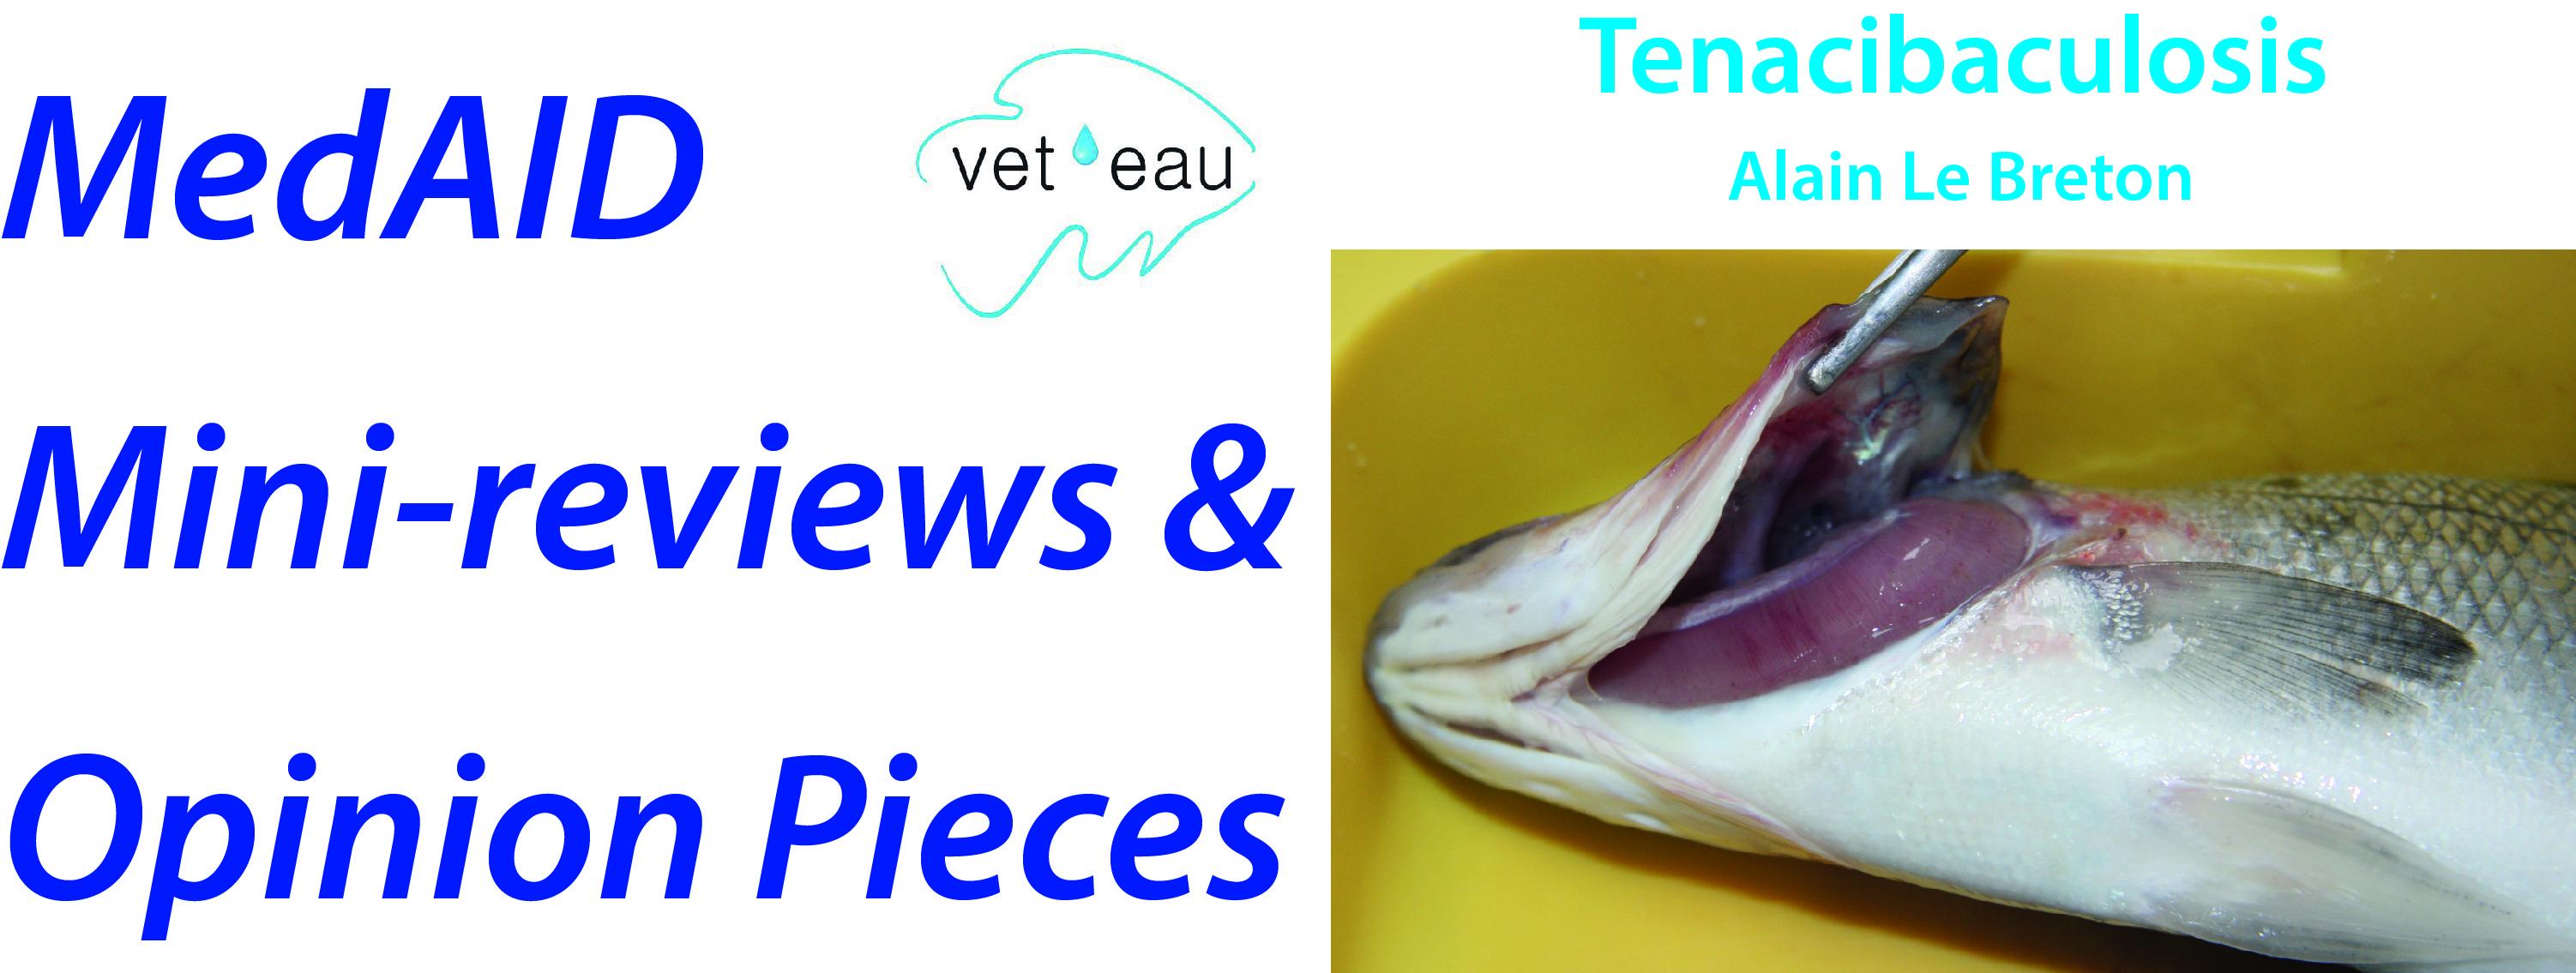 Tenacibaculosis in marine fish – Medaid Mediterranean